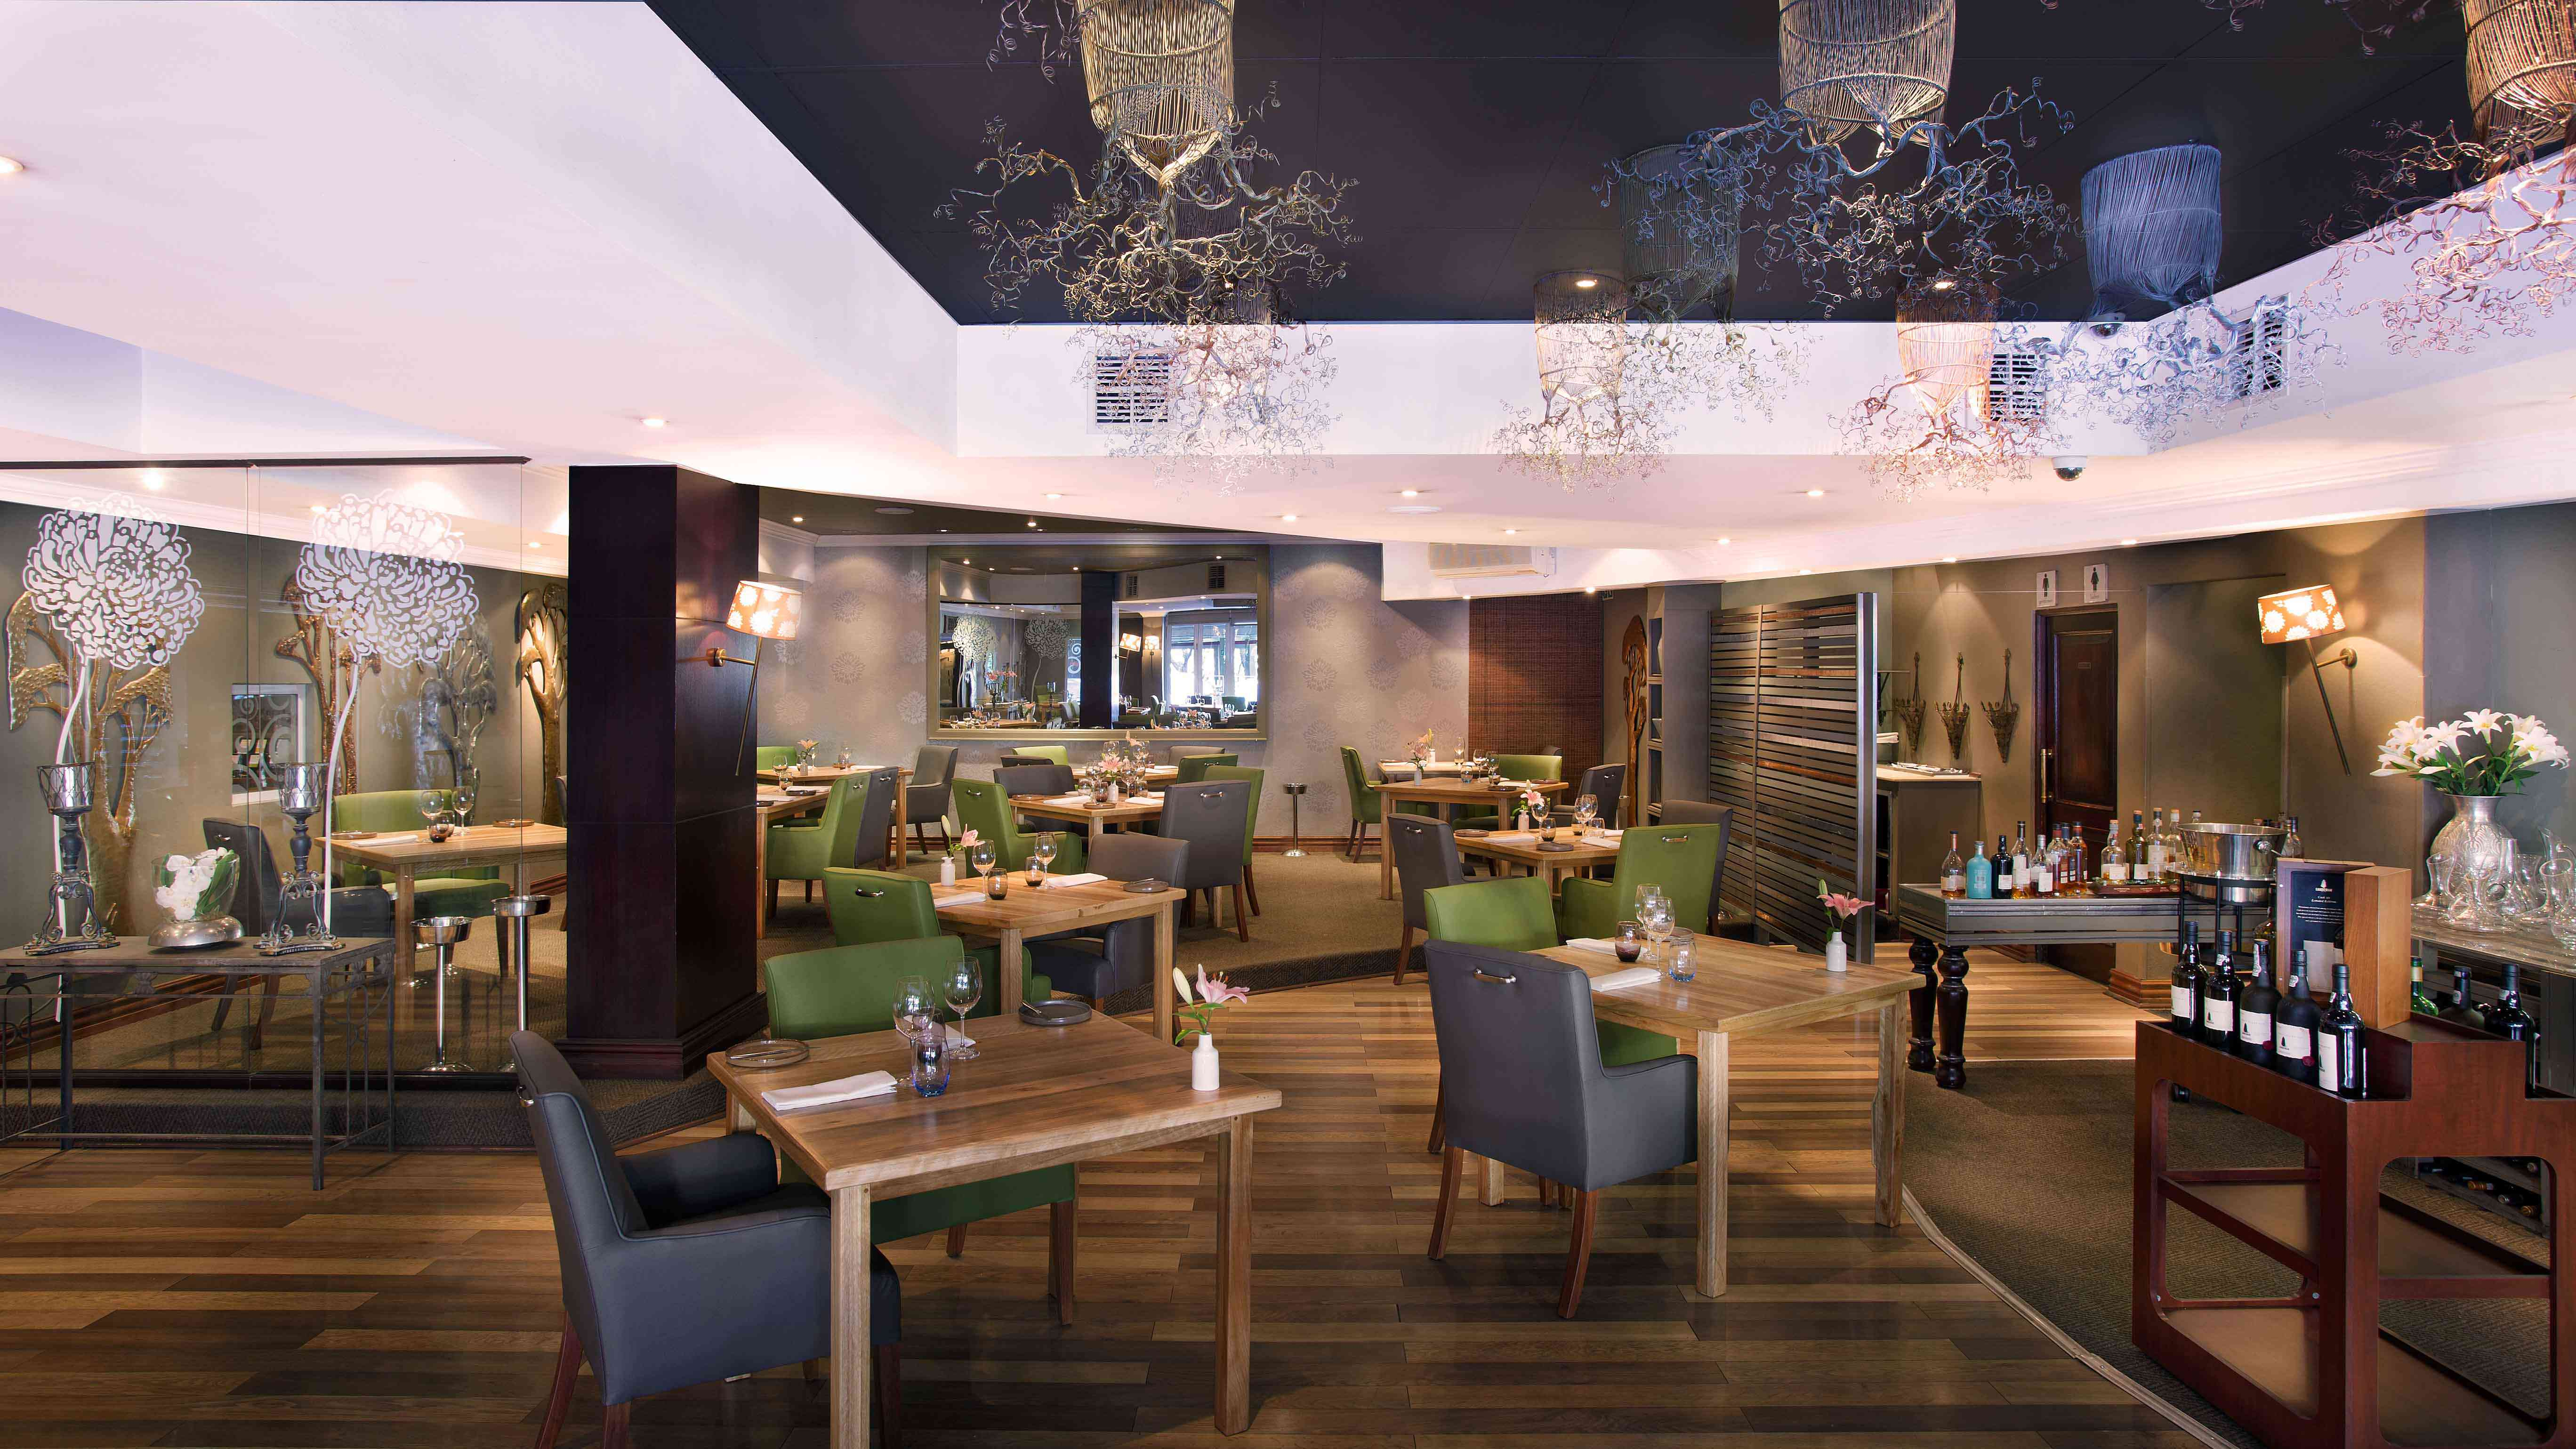 Inside dw eleven-13 restaurant in Johannesburg